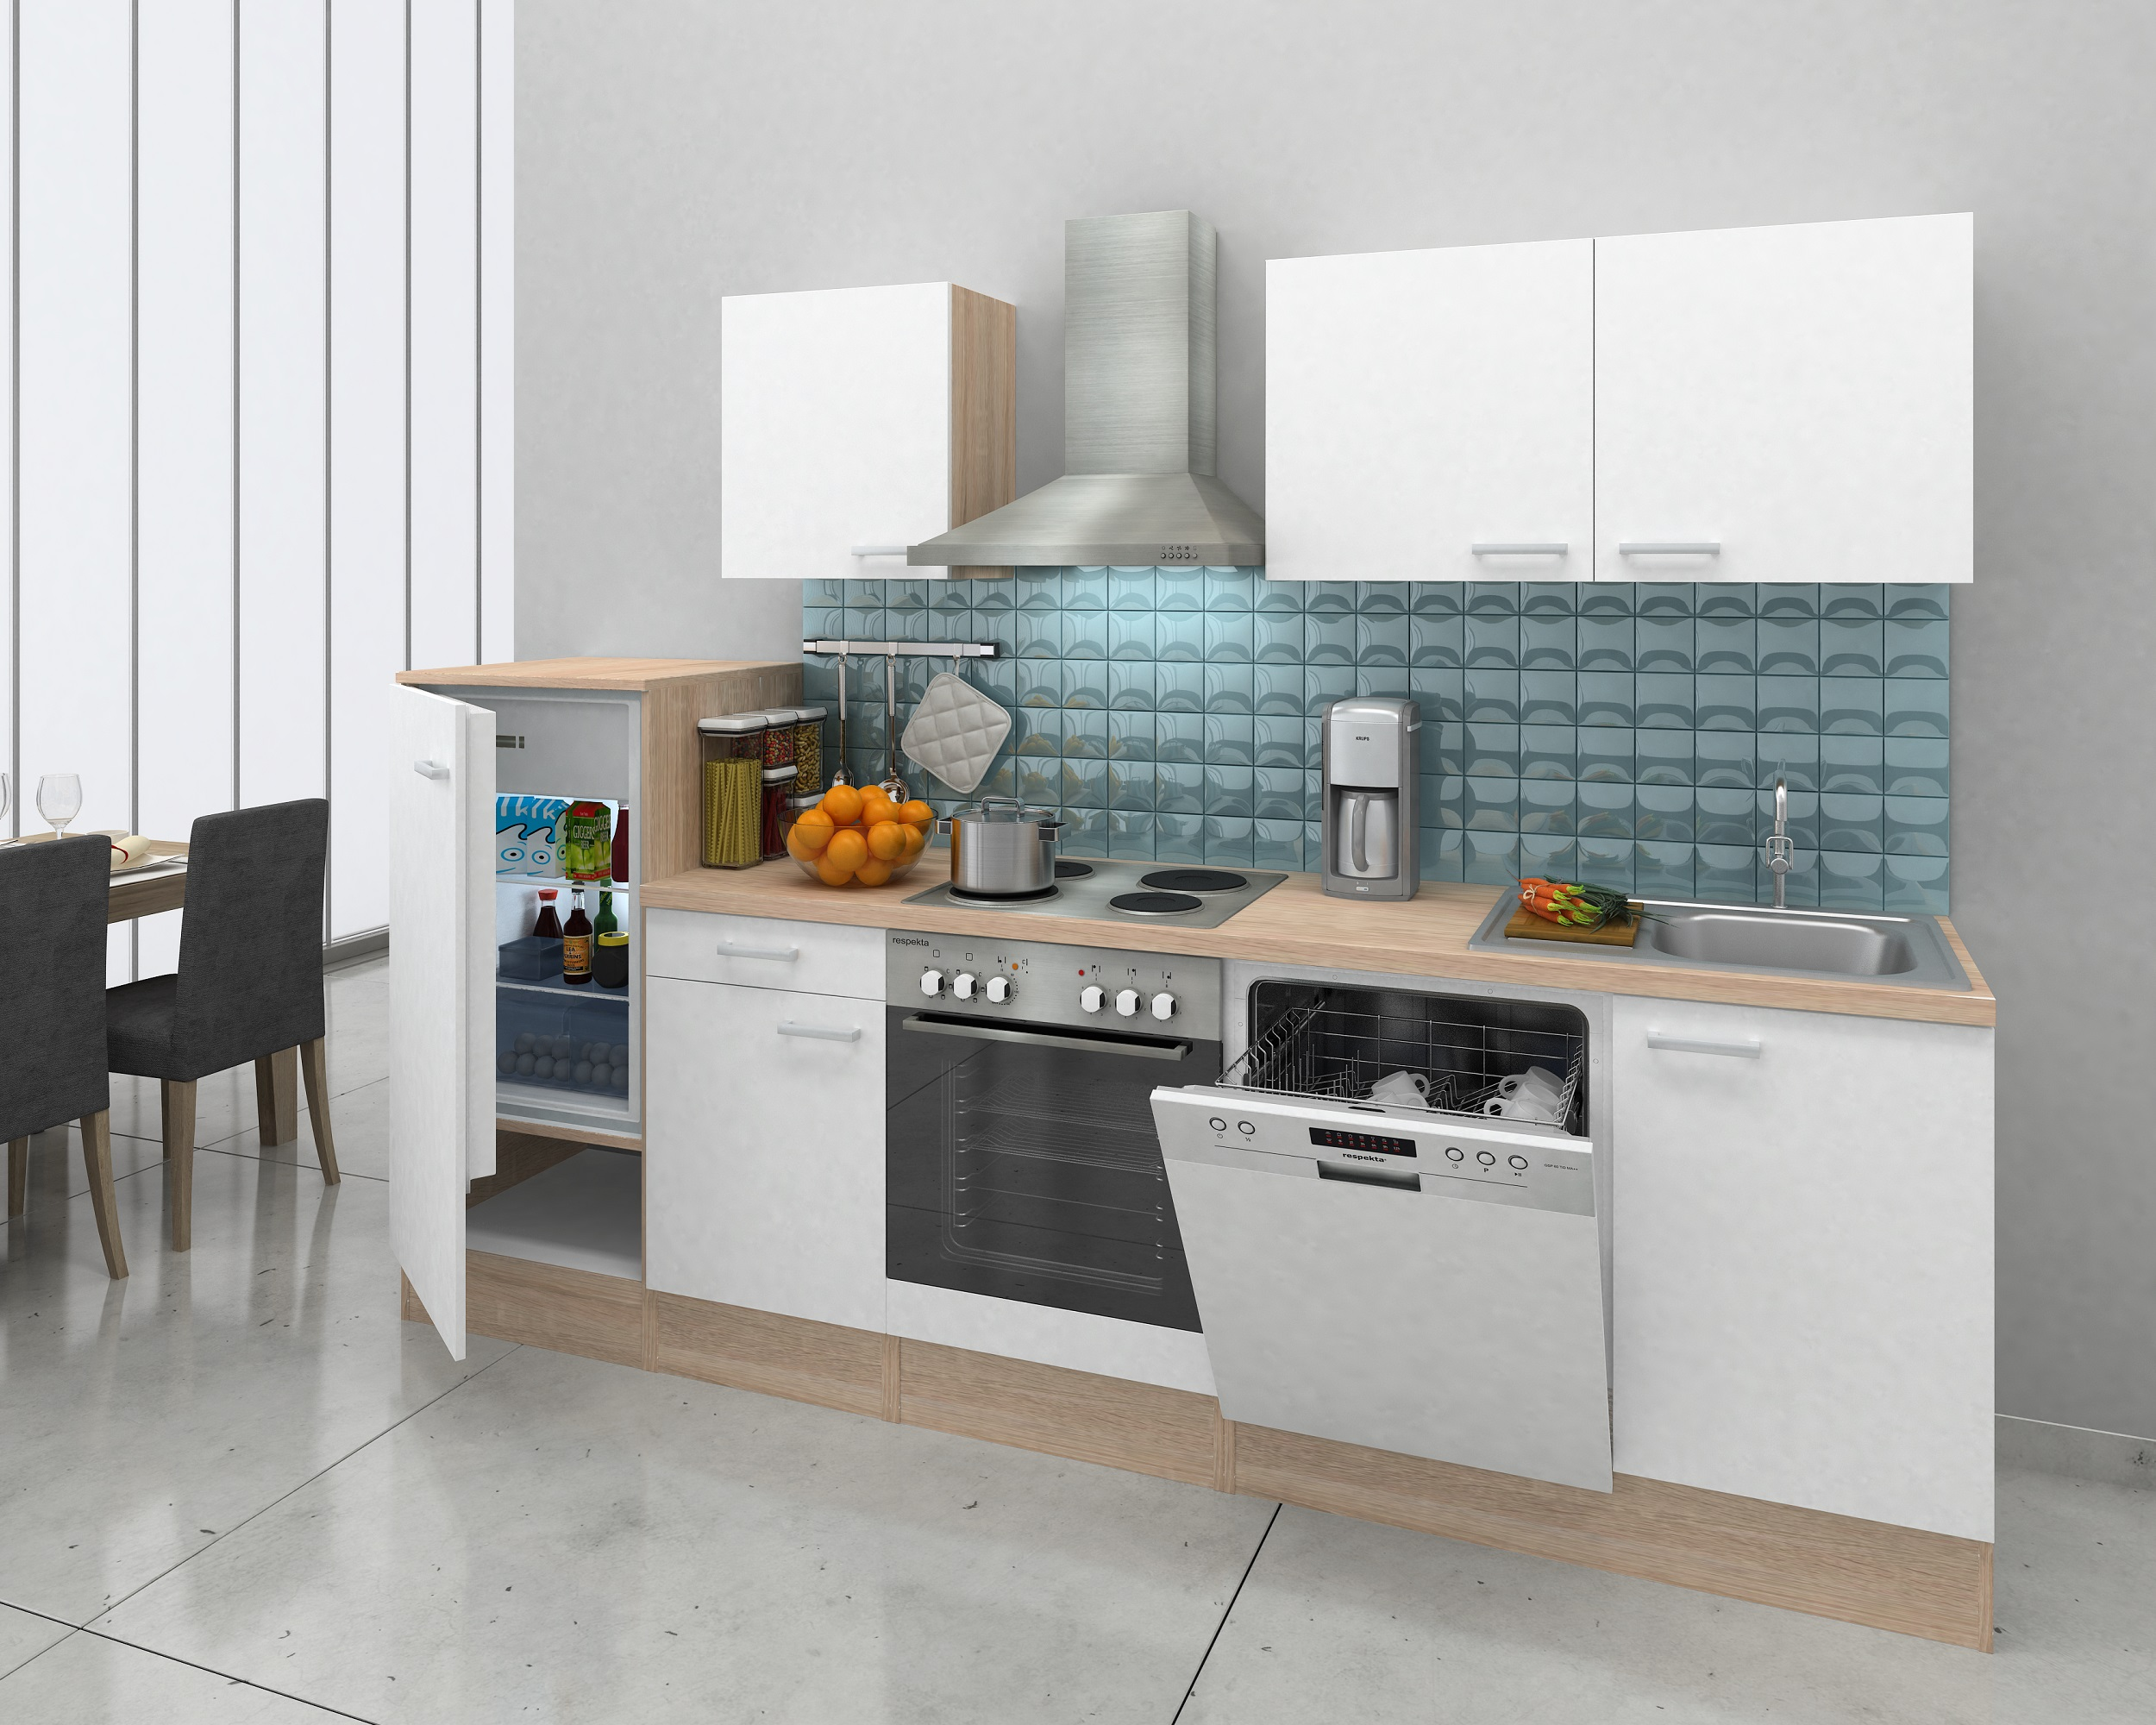 respekta einbau k che k chenzeile k chenblock 280 cm eiche natura nachb weiss ebay. Black Bedroom Furniture Sets. Home Design Ideas